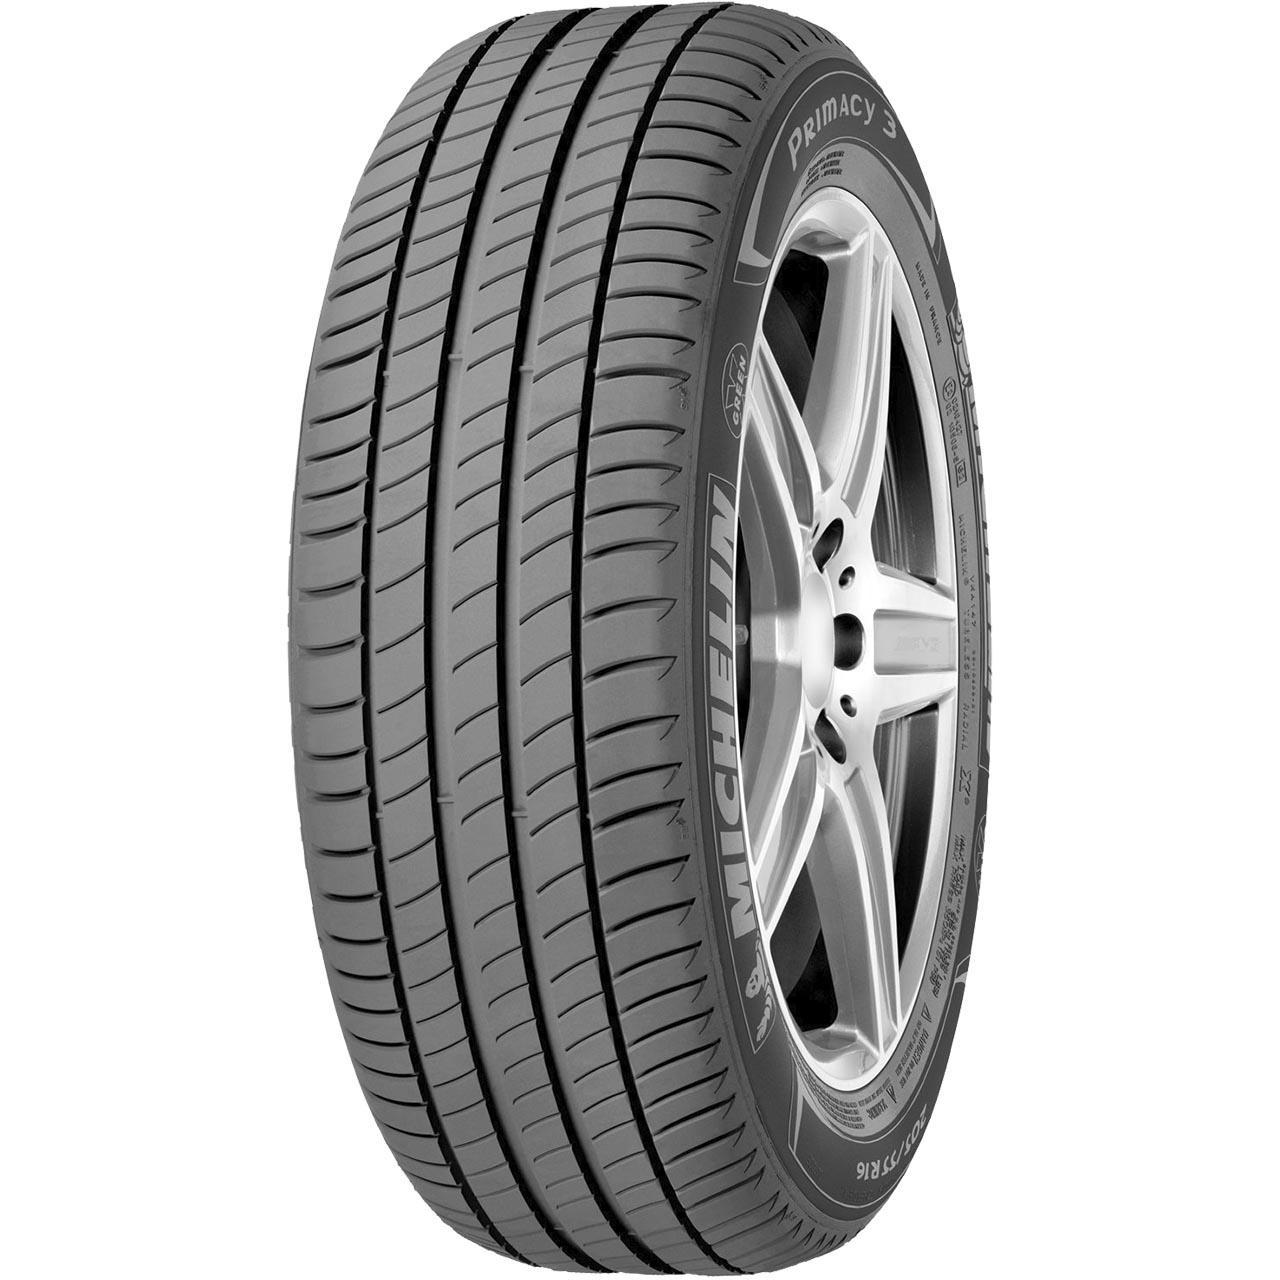 Michelin Primacy 3 245/45R18 100Y XL FSL AO